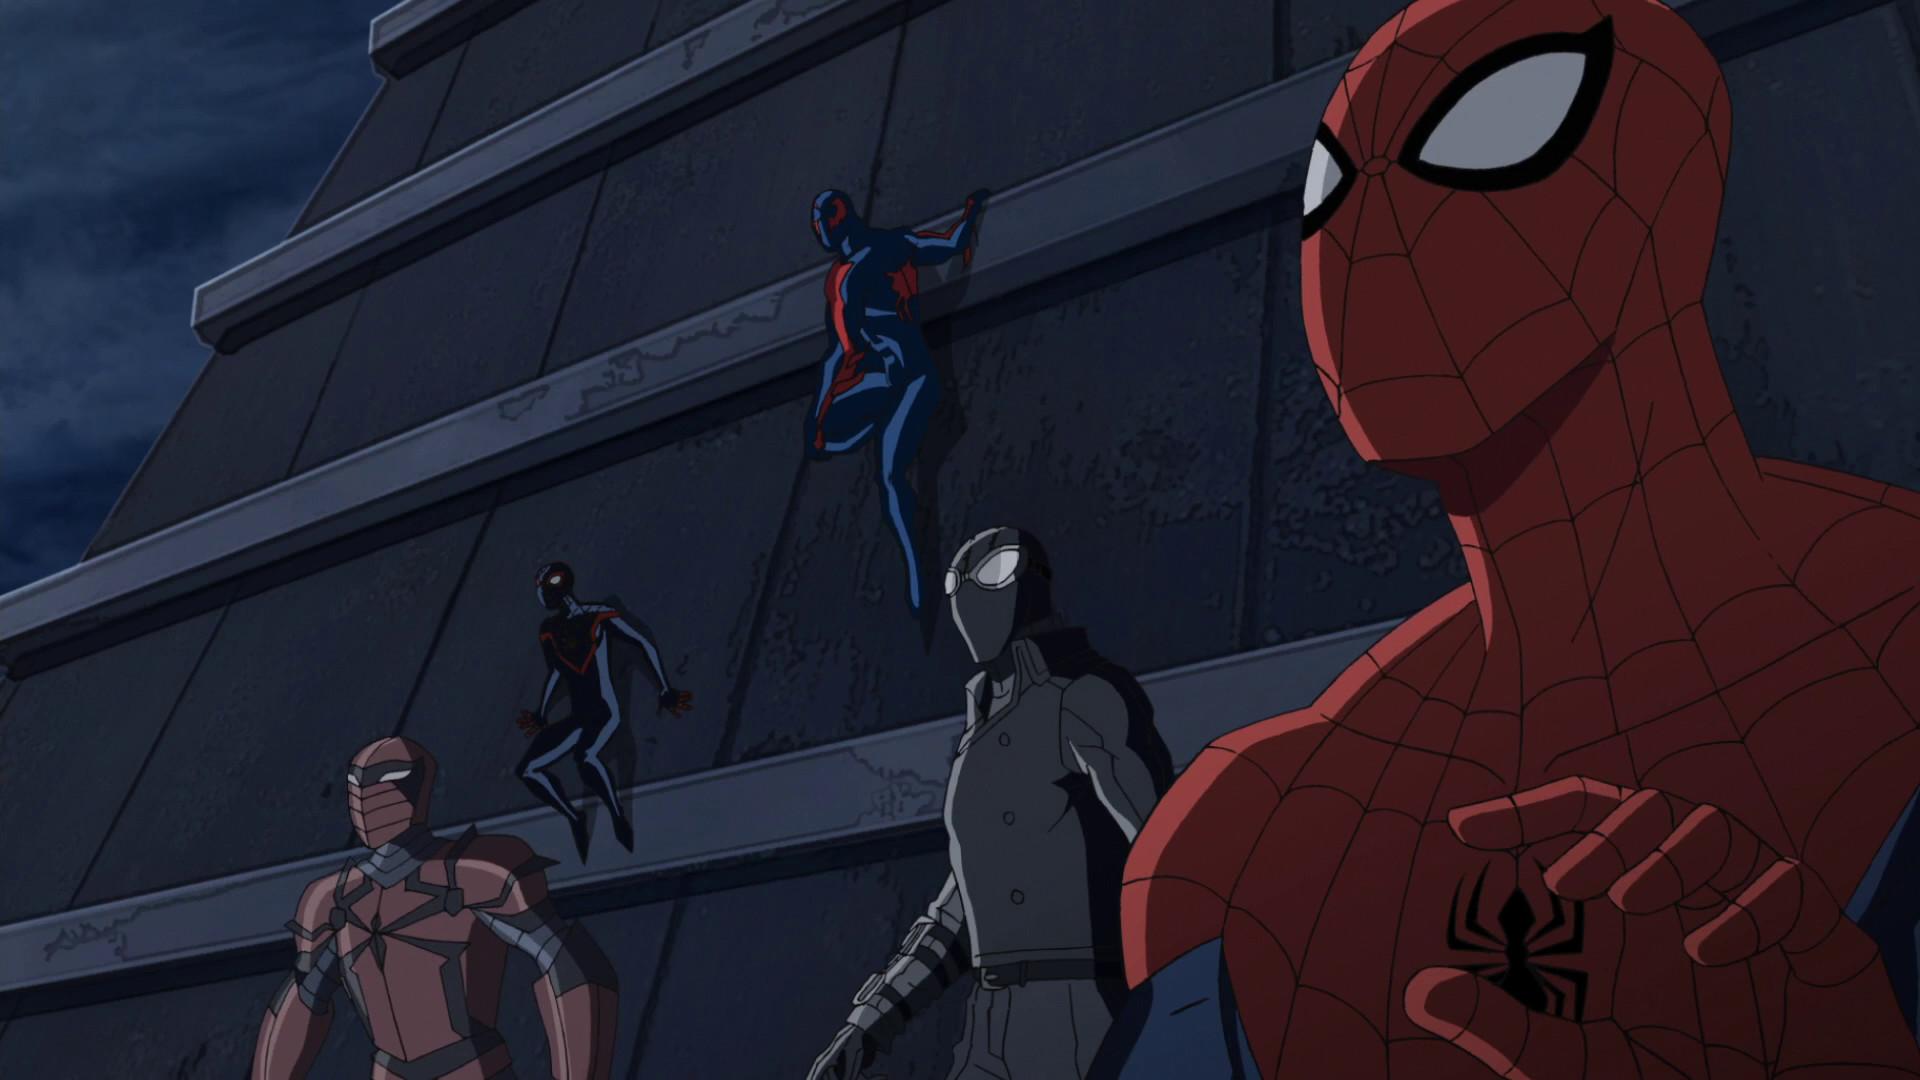 Spider-Man 2099, Spider-Man, Spider-Man Noir, Spyder-Knight, Miles Morales  USMWW.png